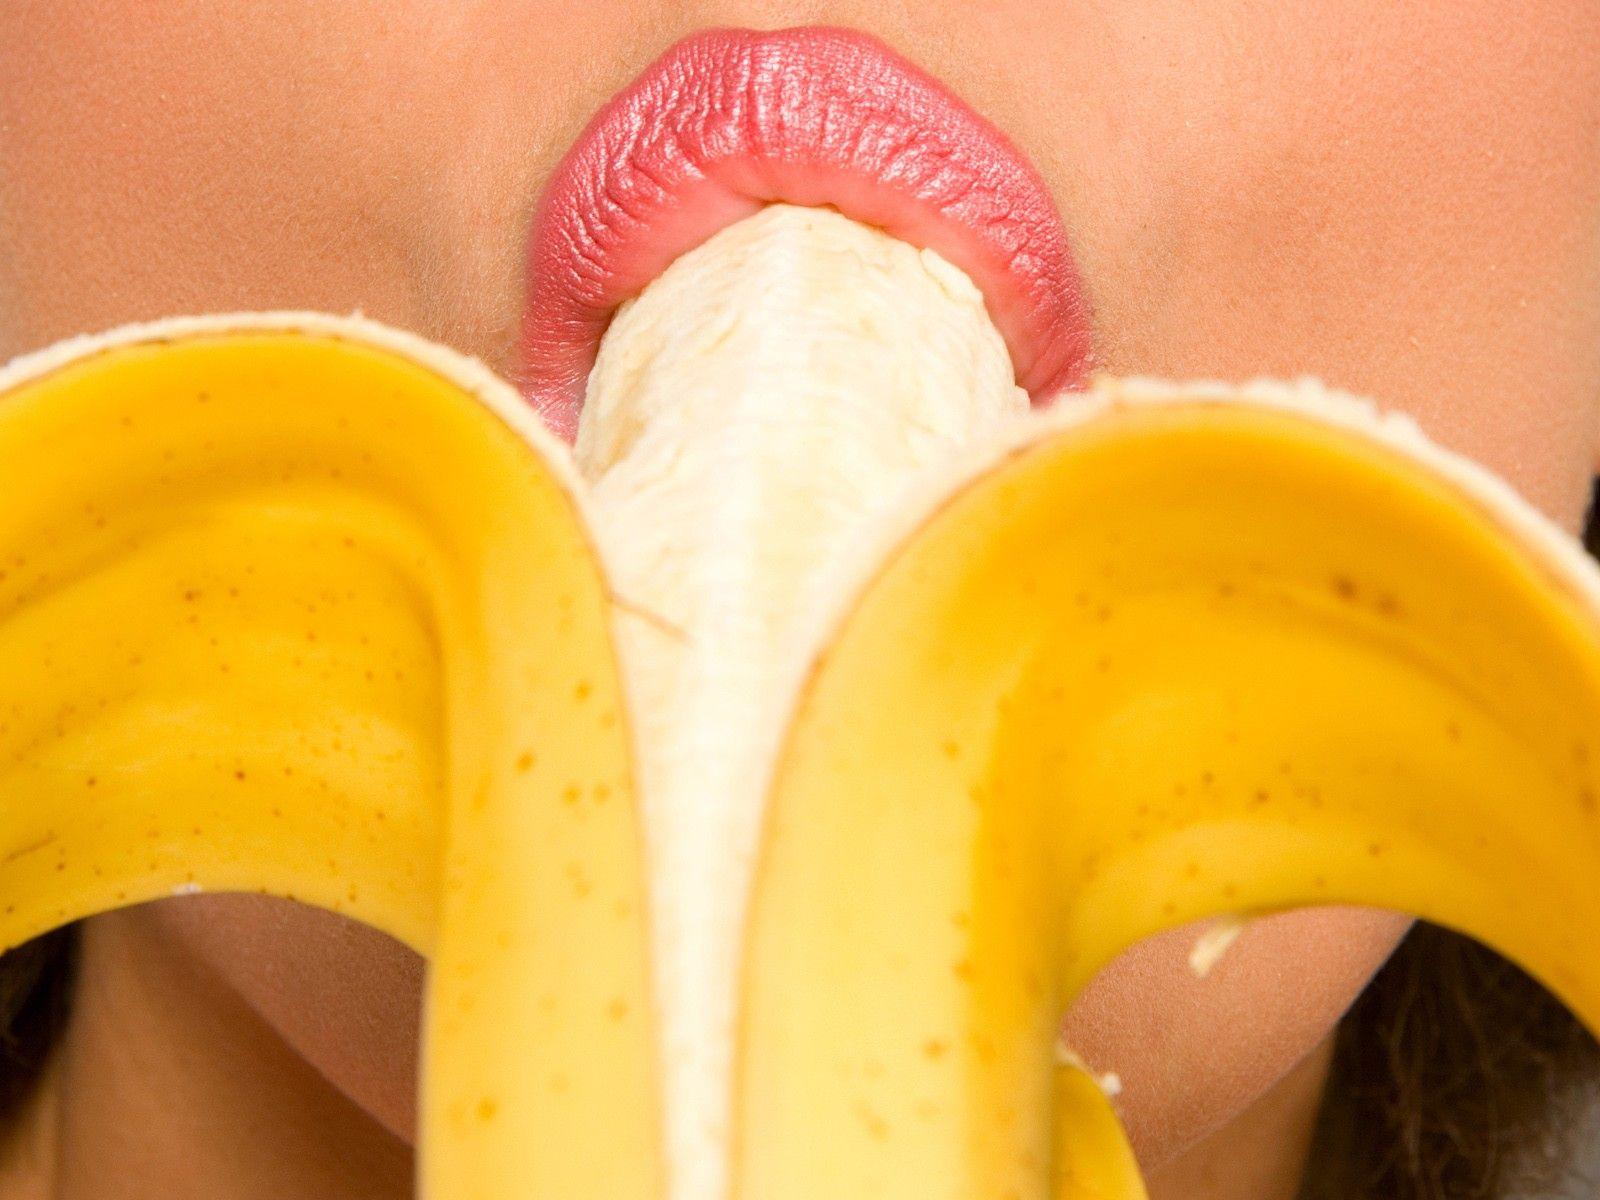 Два банана и один член скачать фото 247-986